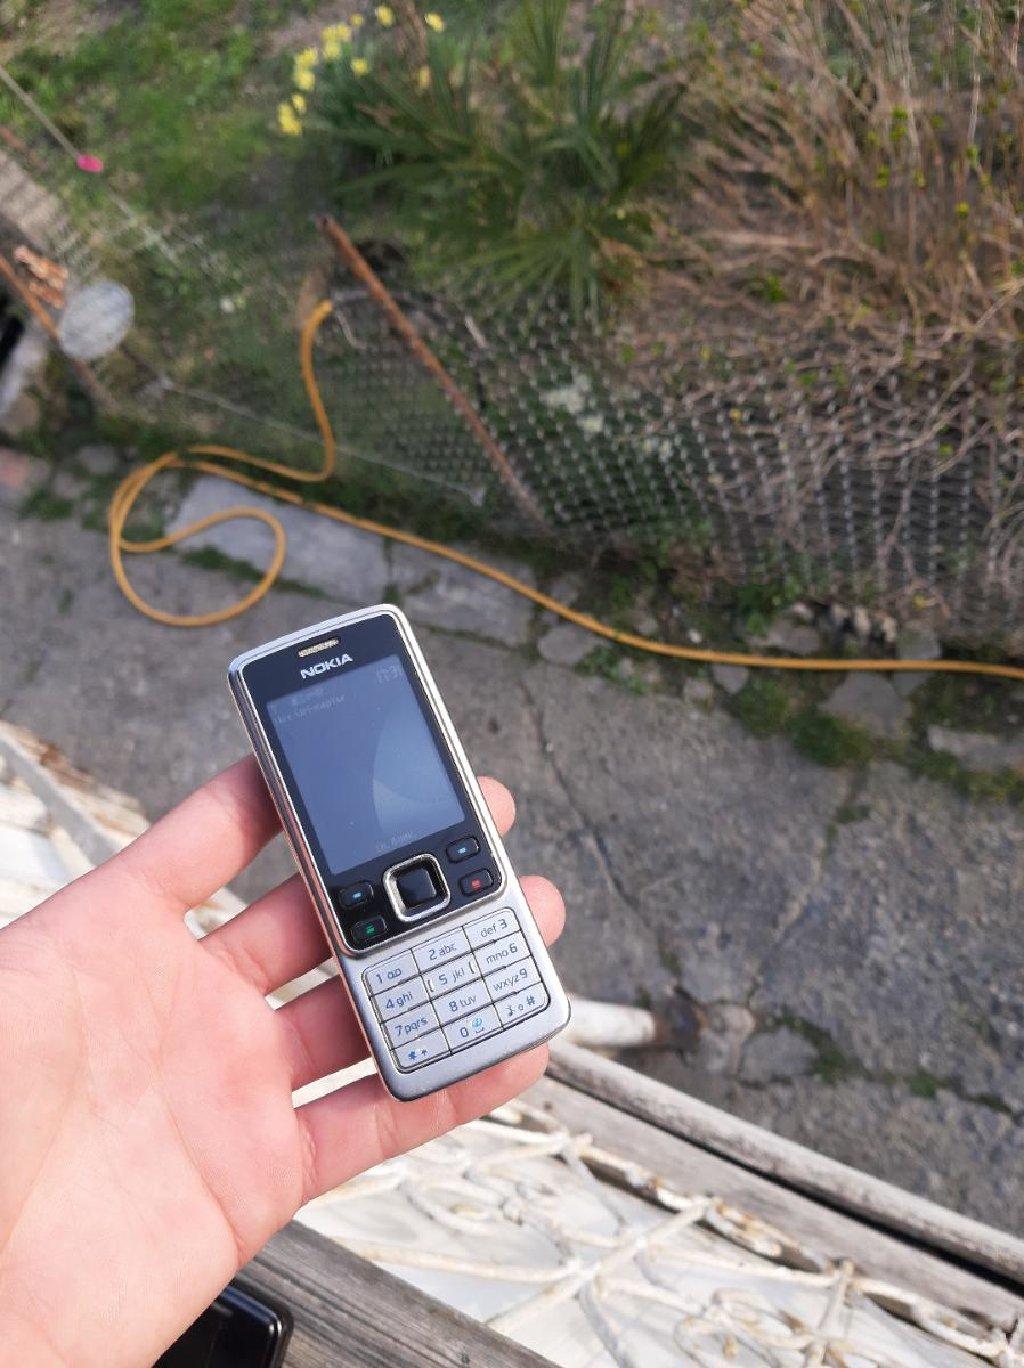 Nokia 6300 prablemsiz